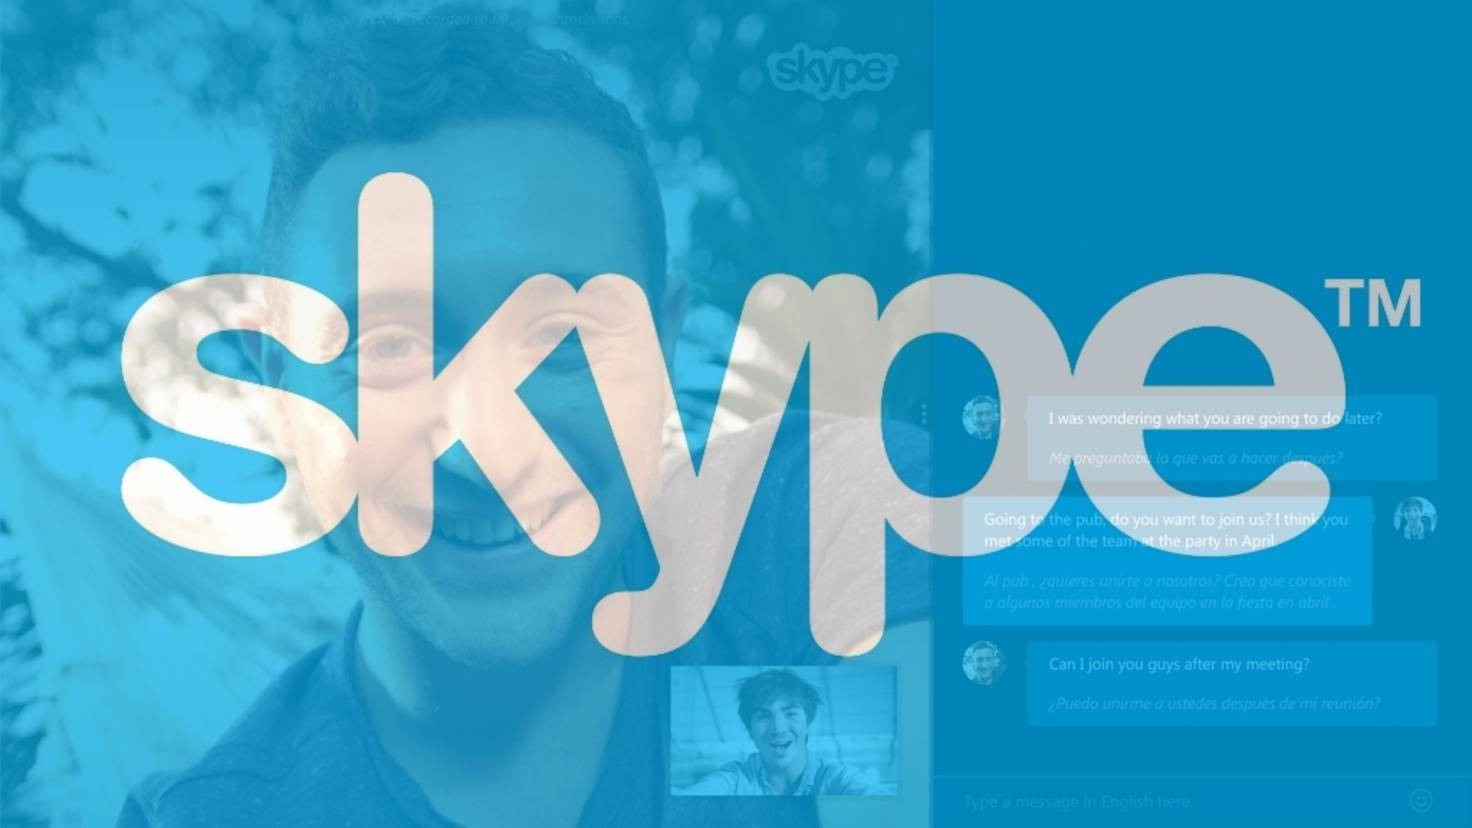 Skype-01